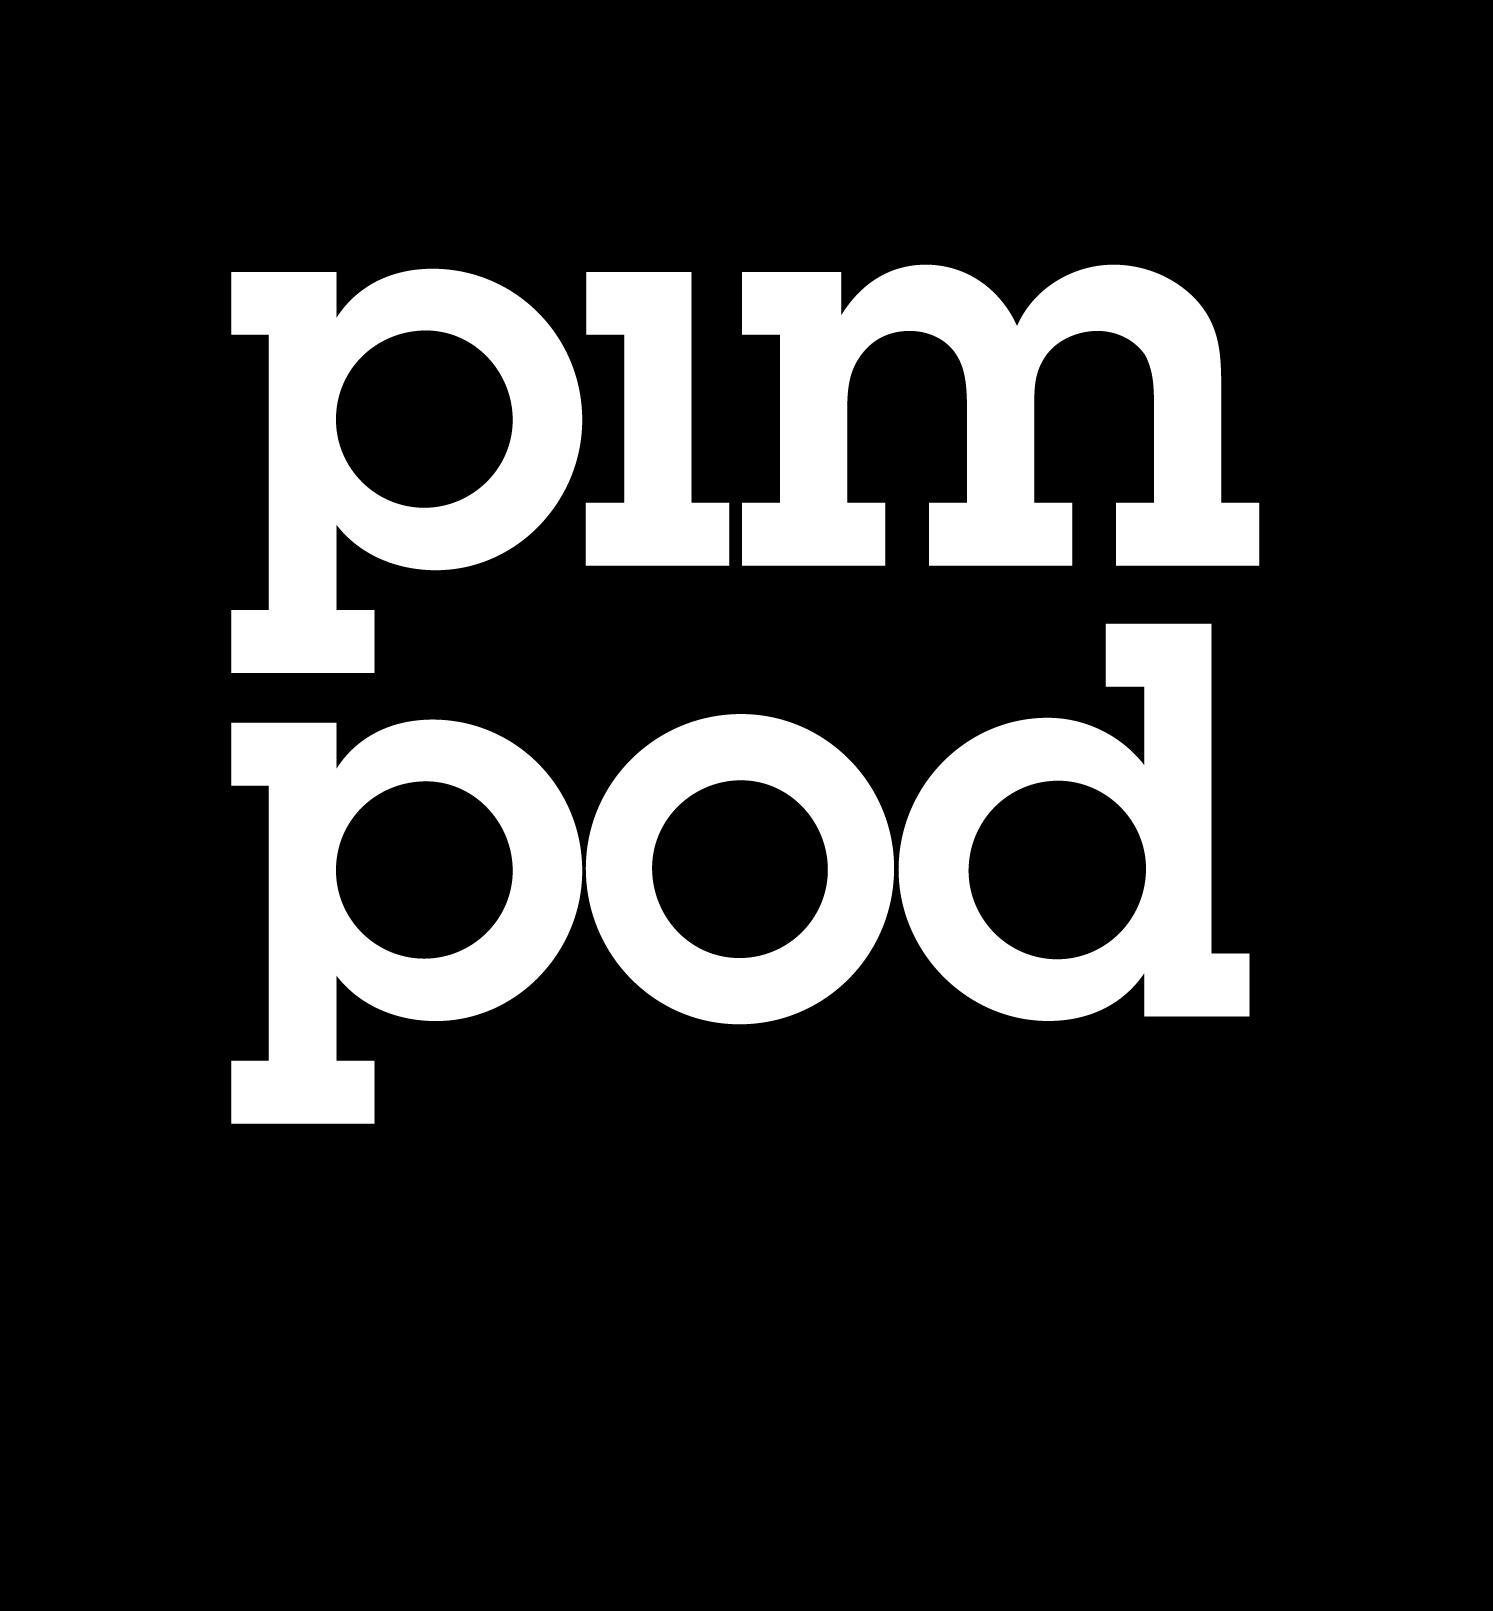 pimpod